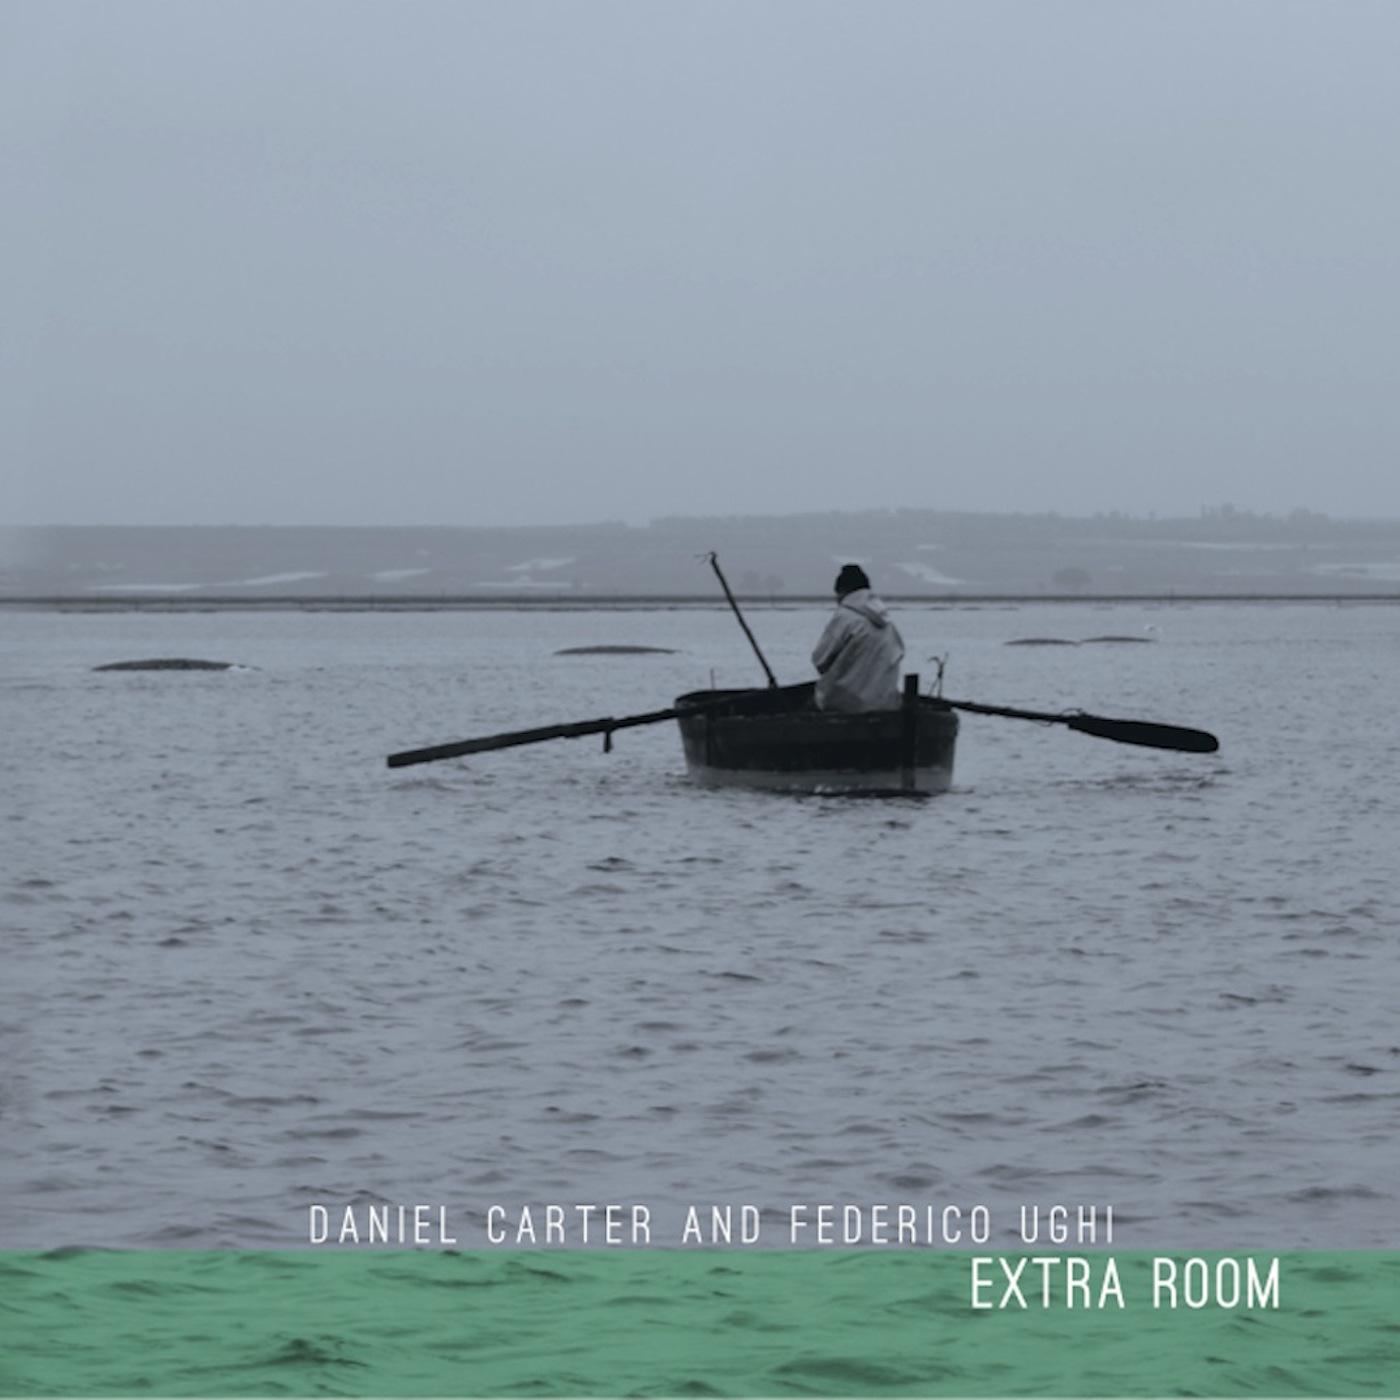 DANIEL CARTER & FEDERICO UGHI EXTRA ROOM - VINYL REISSUE